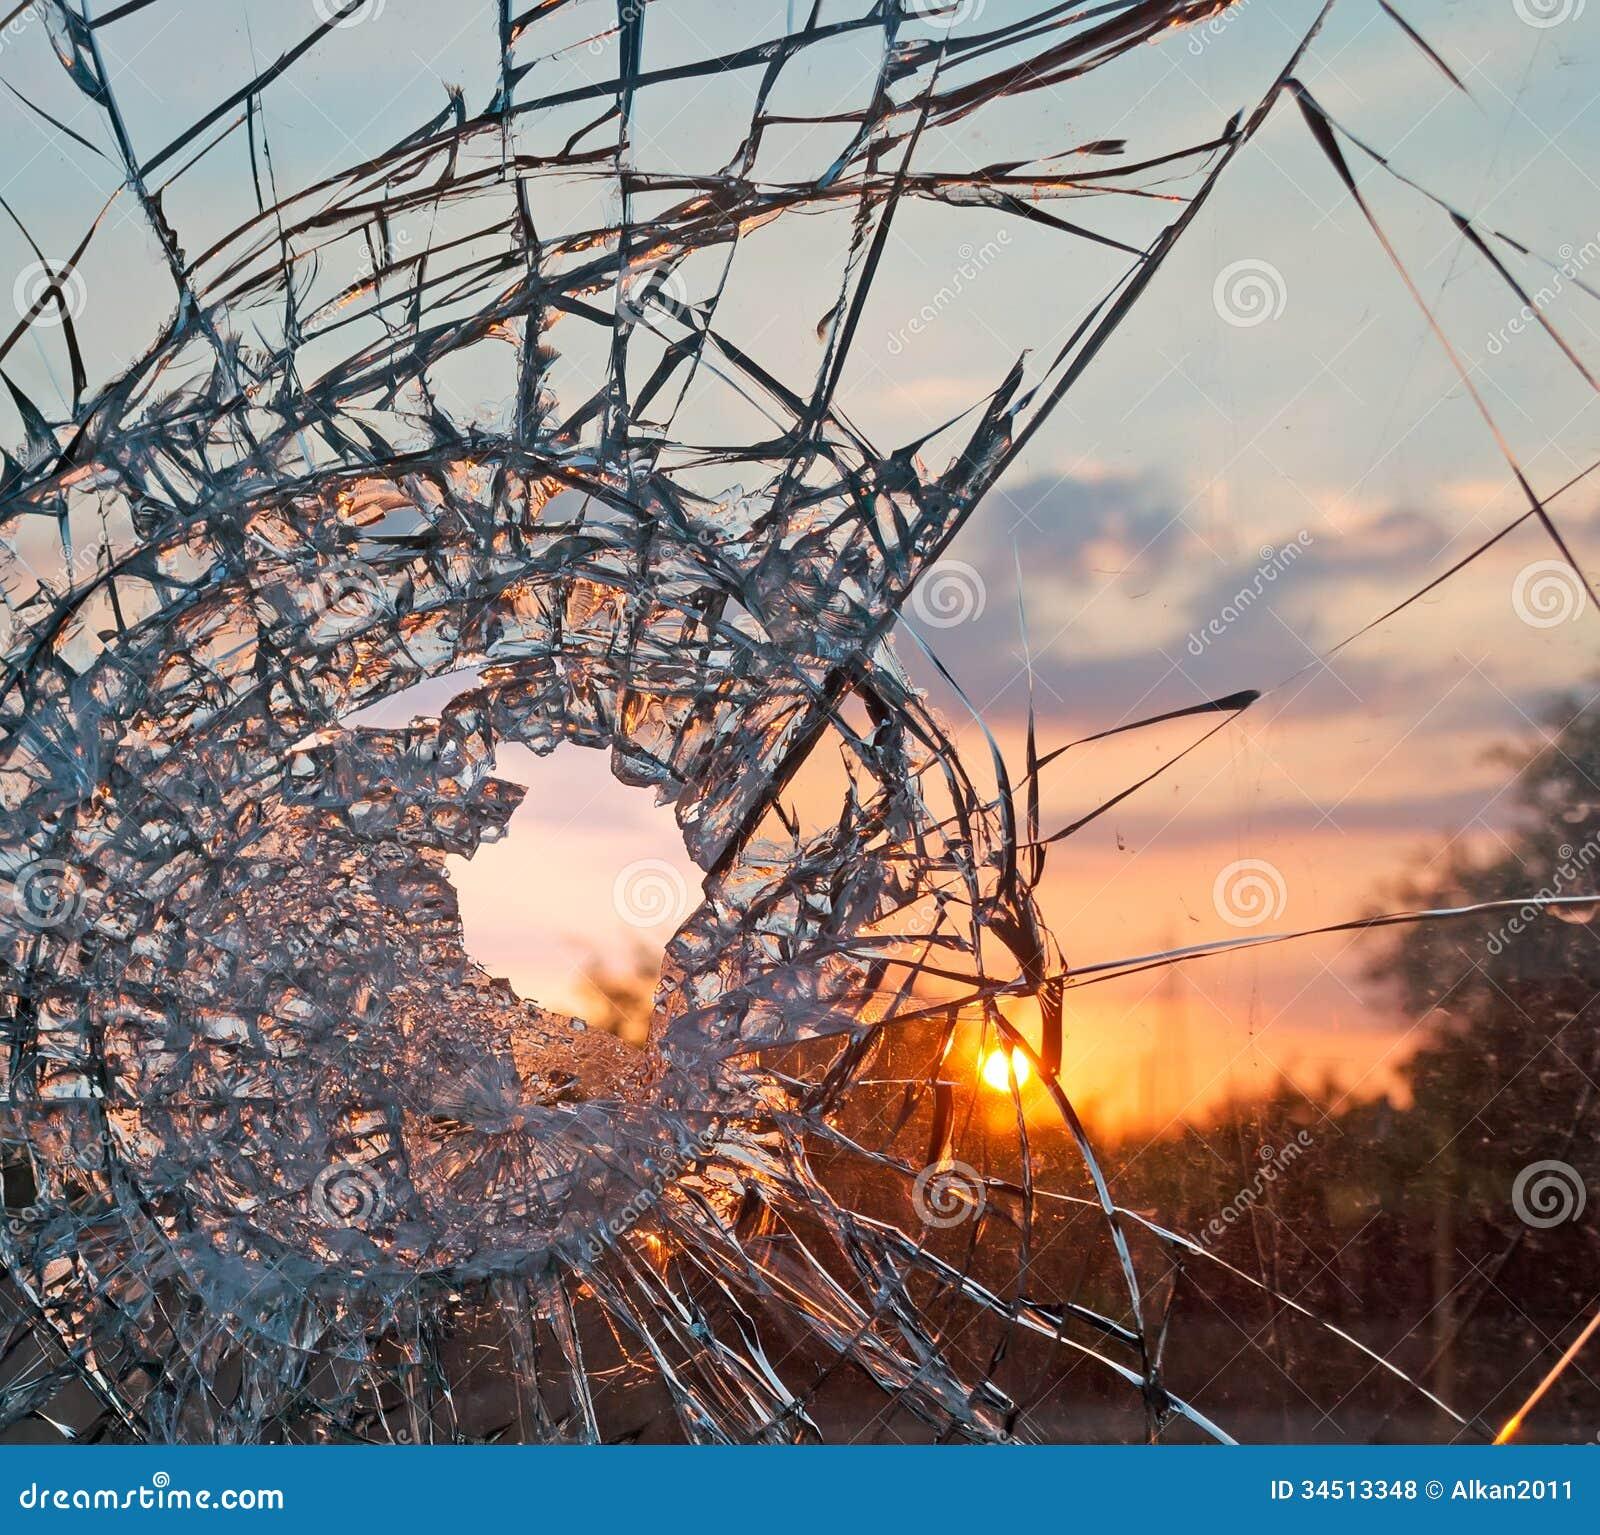 Broken Glass Windows Free Stock Photo